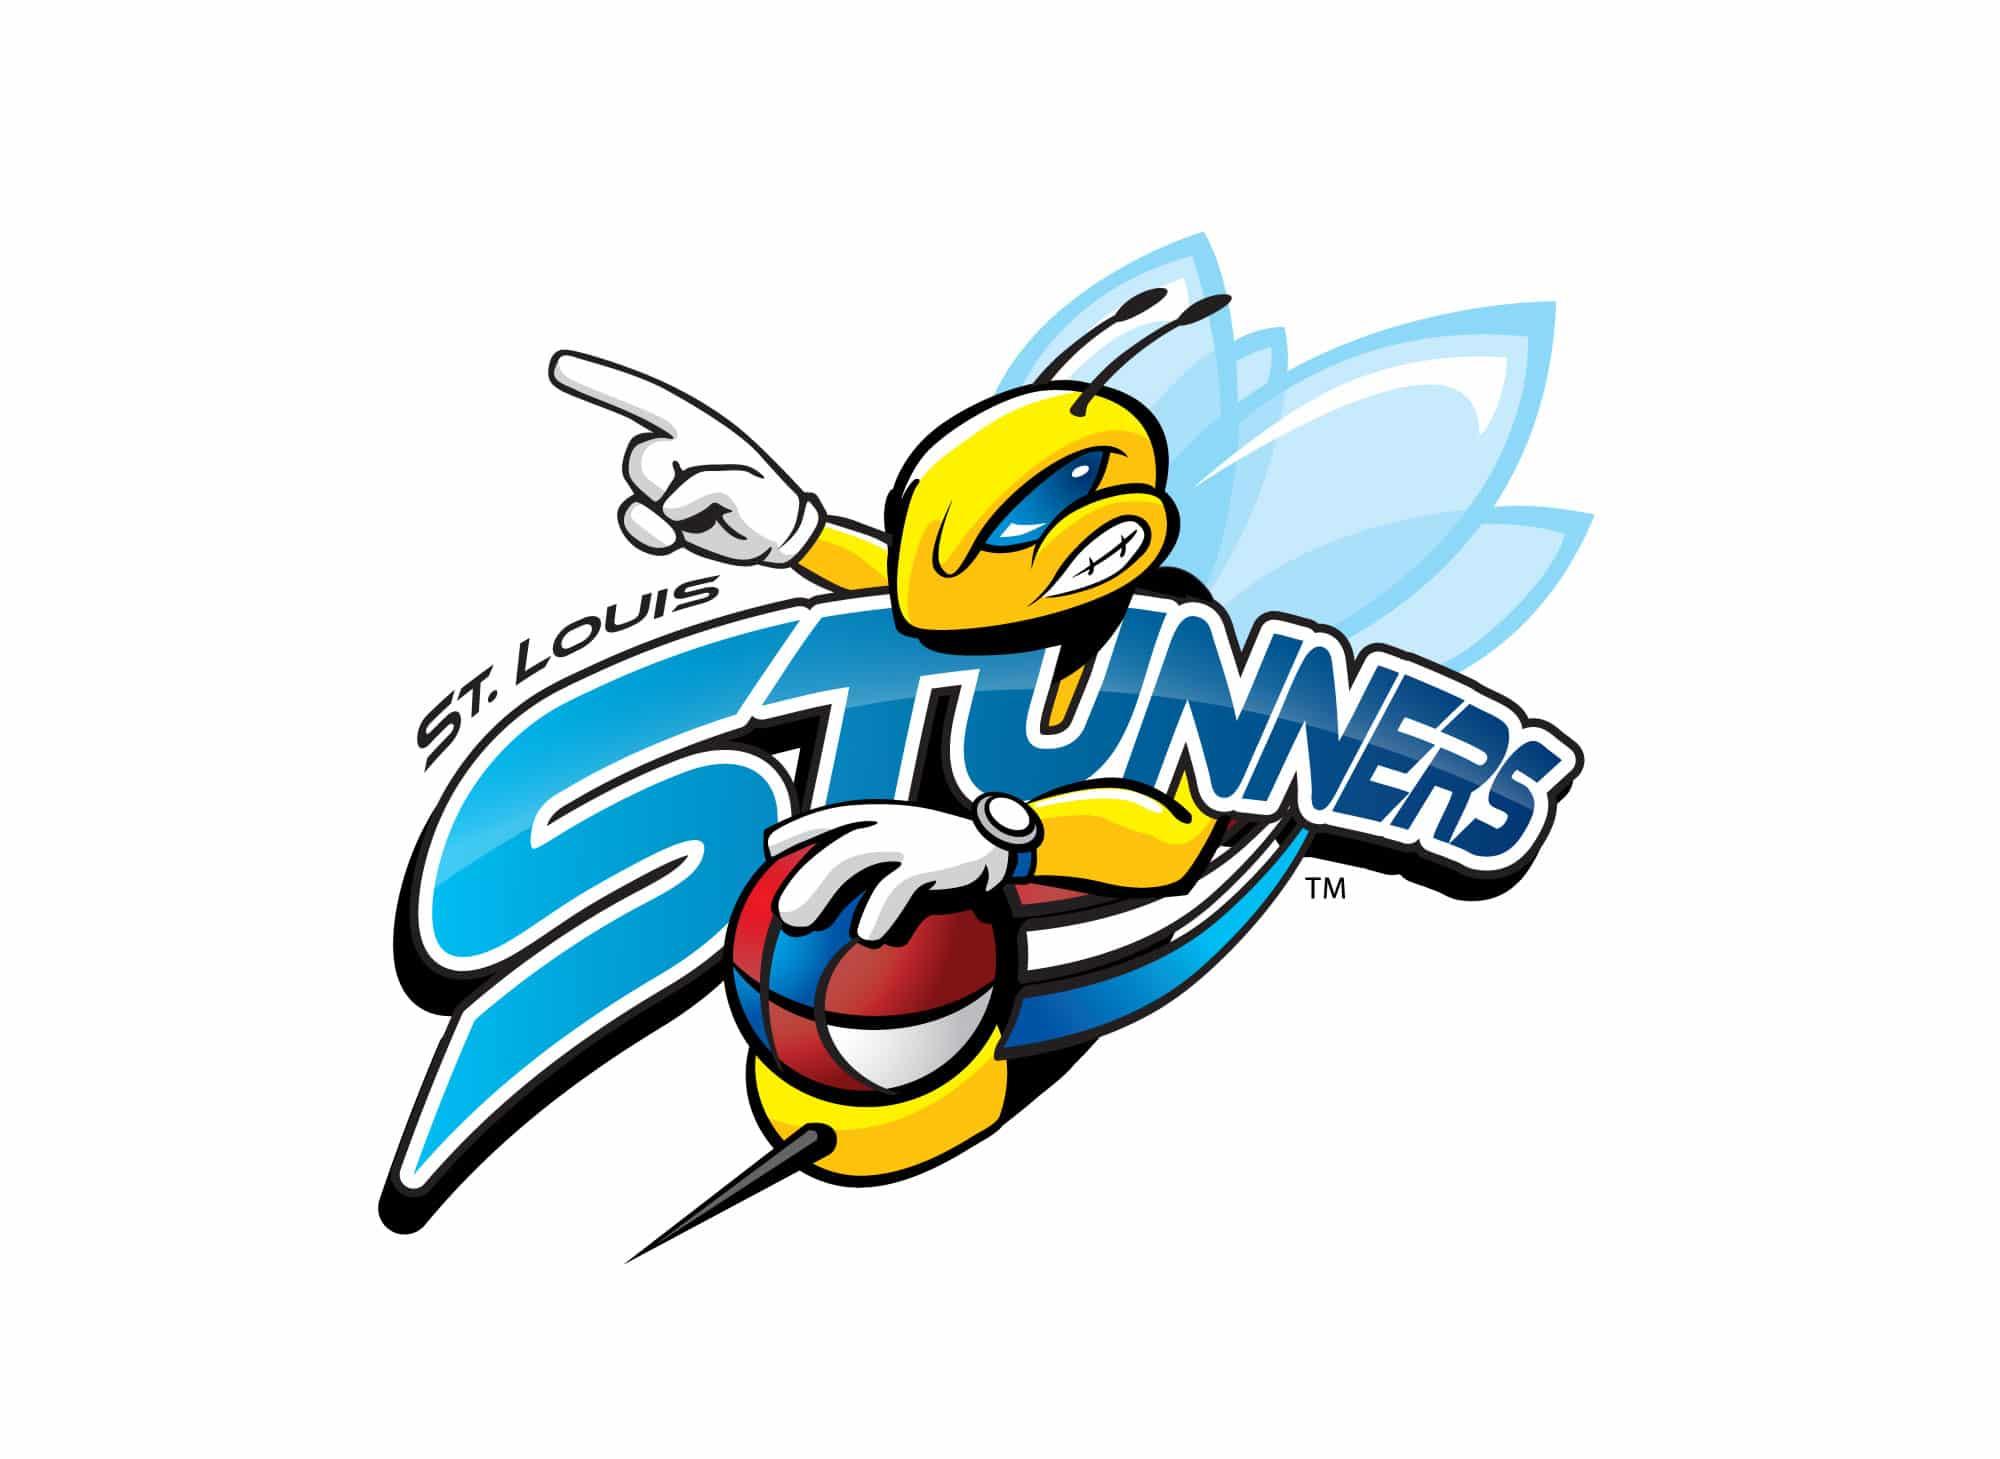 Stunners-logo-design